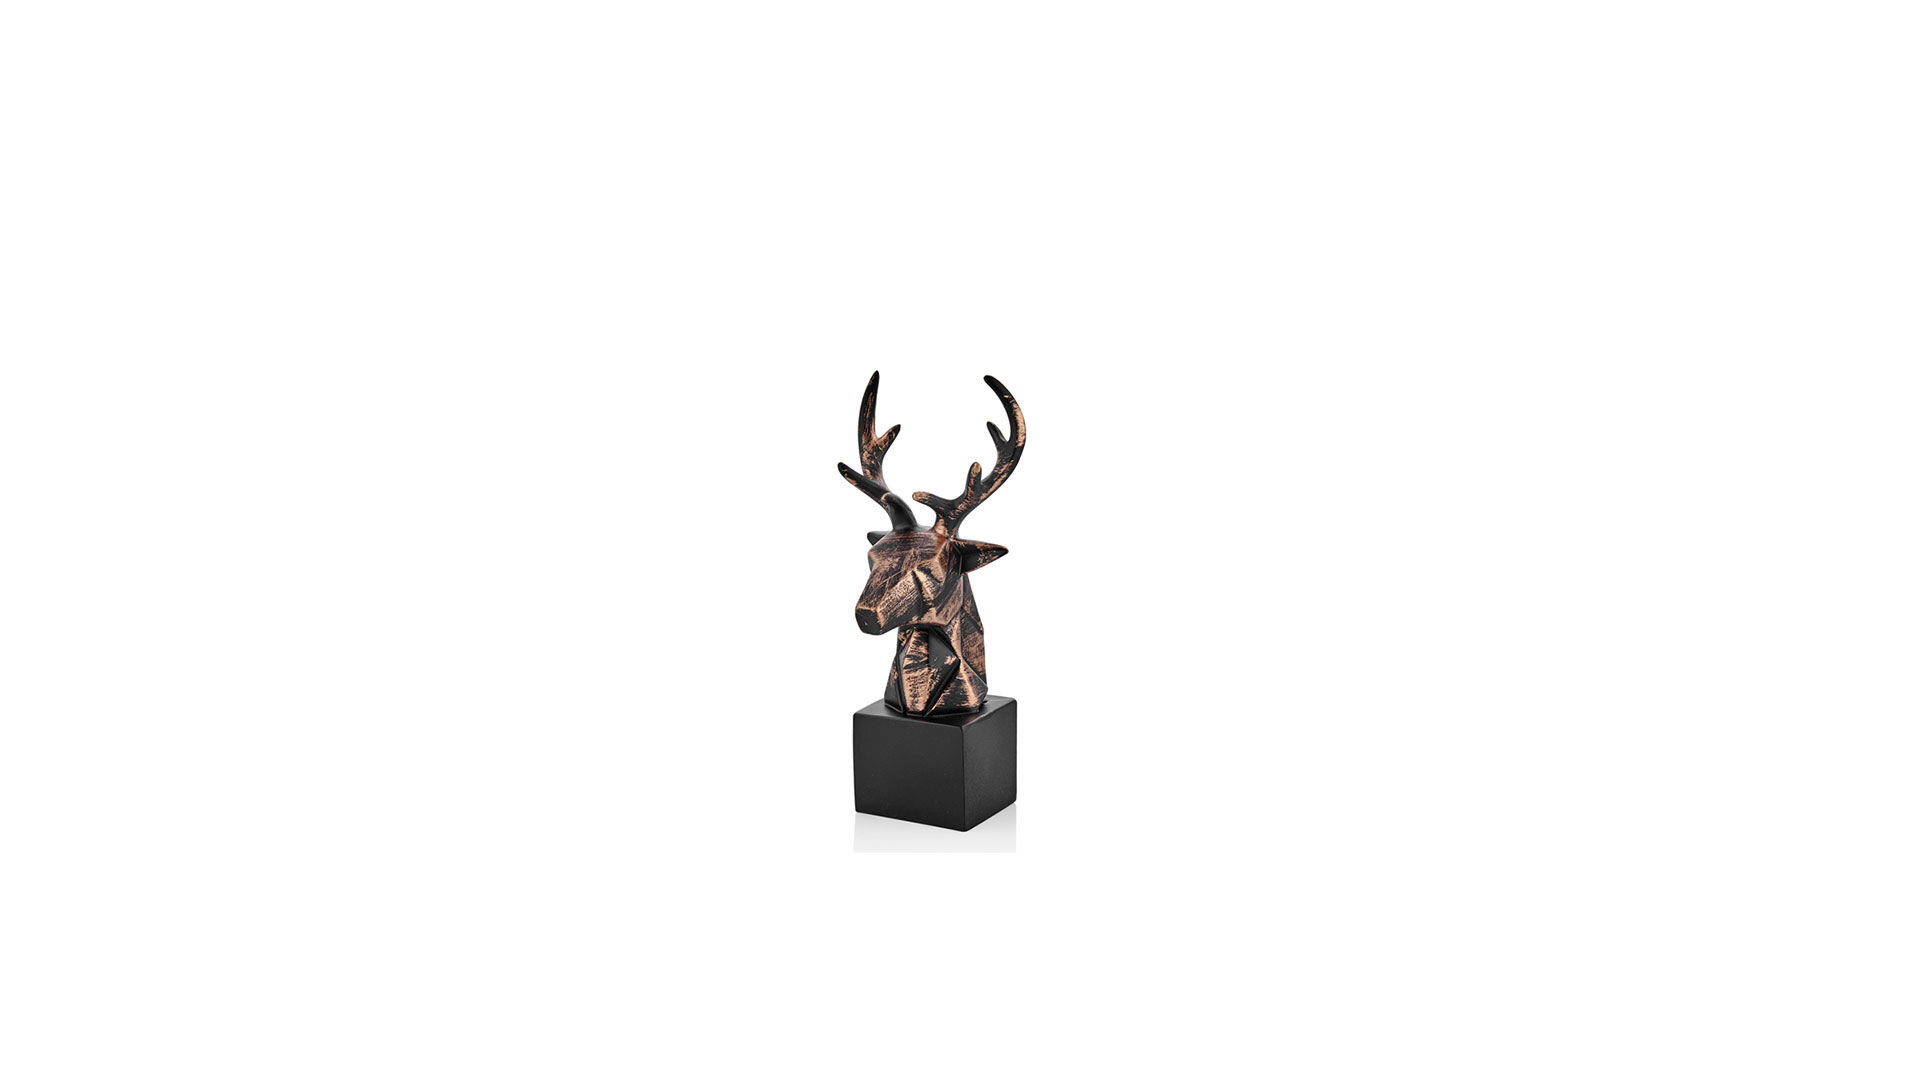 Nordic Dekoratif Geyik Figür